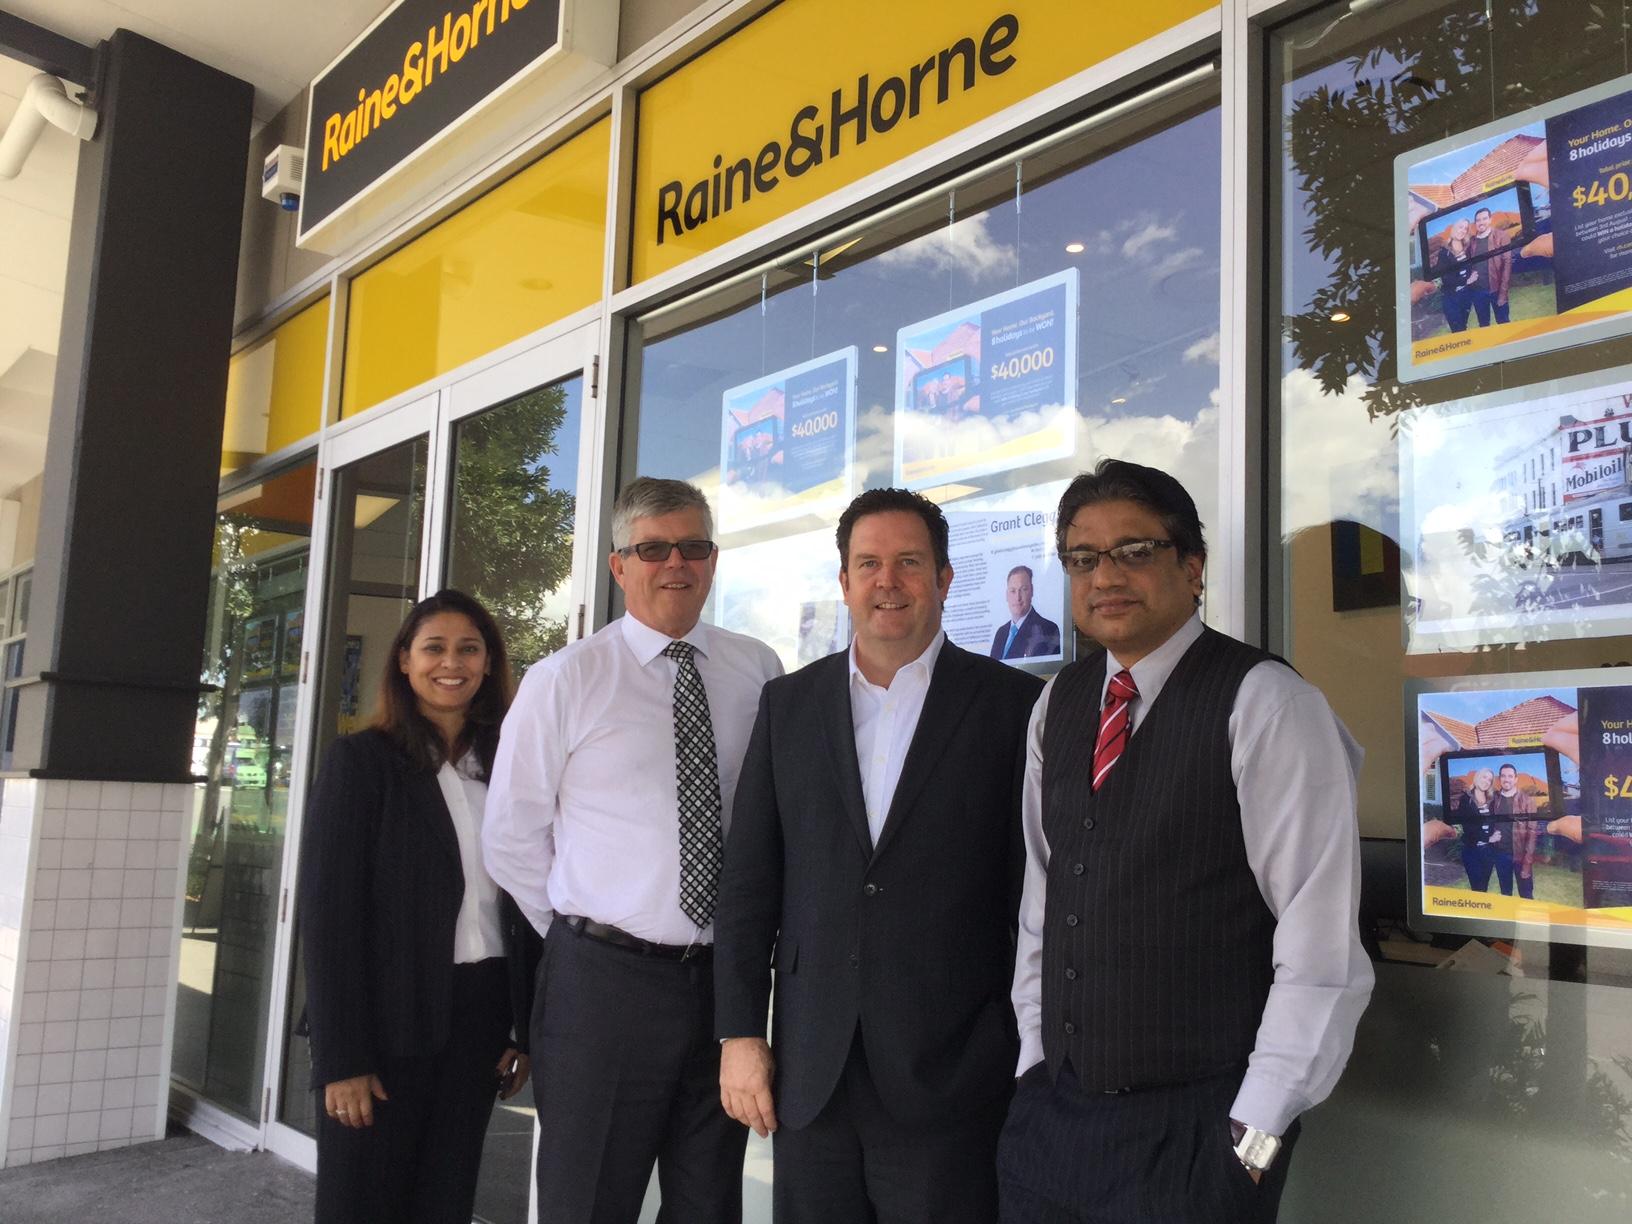 Raine & Horne Woolloongabba - Shilpa Karri, QLD General Manager Steve Worrad, Executive Chairman Angus Raine, Ram Karri